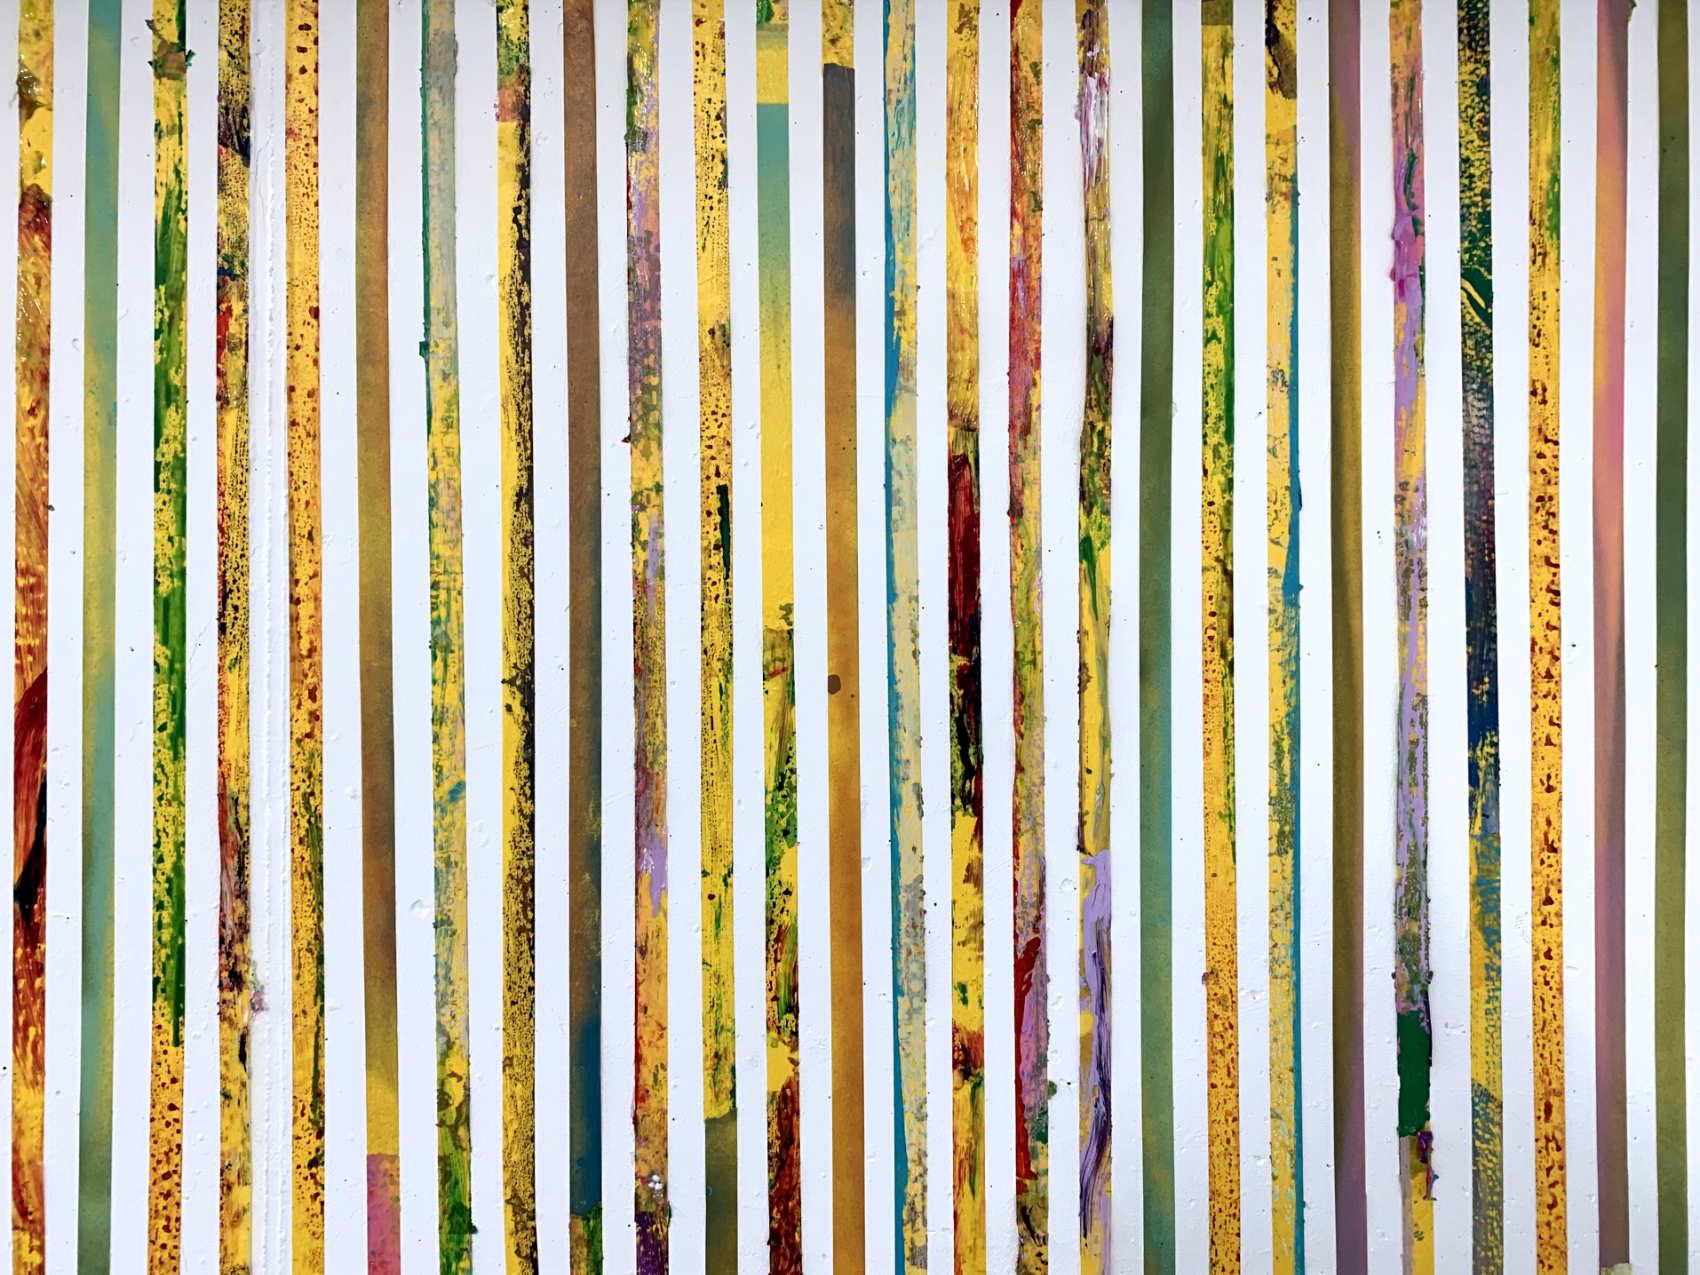 Installation, 2019, Club d'Art Contemporain, Lausanne,  ruban adhésif, peinture acrylique